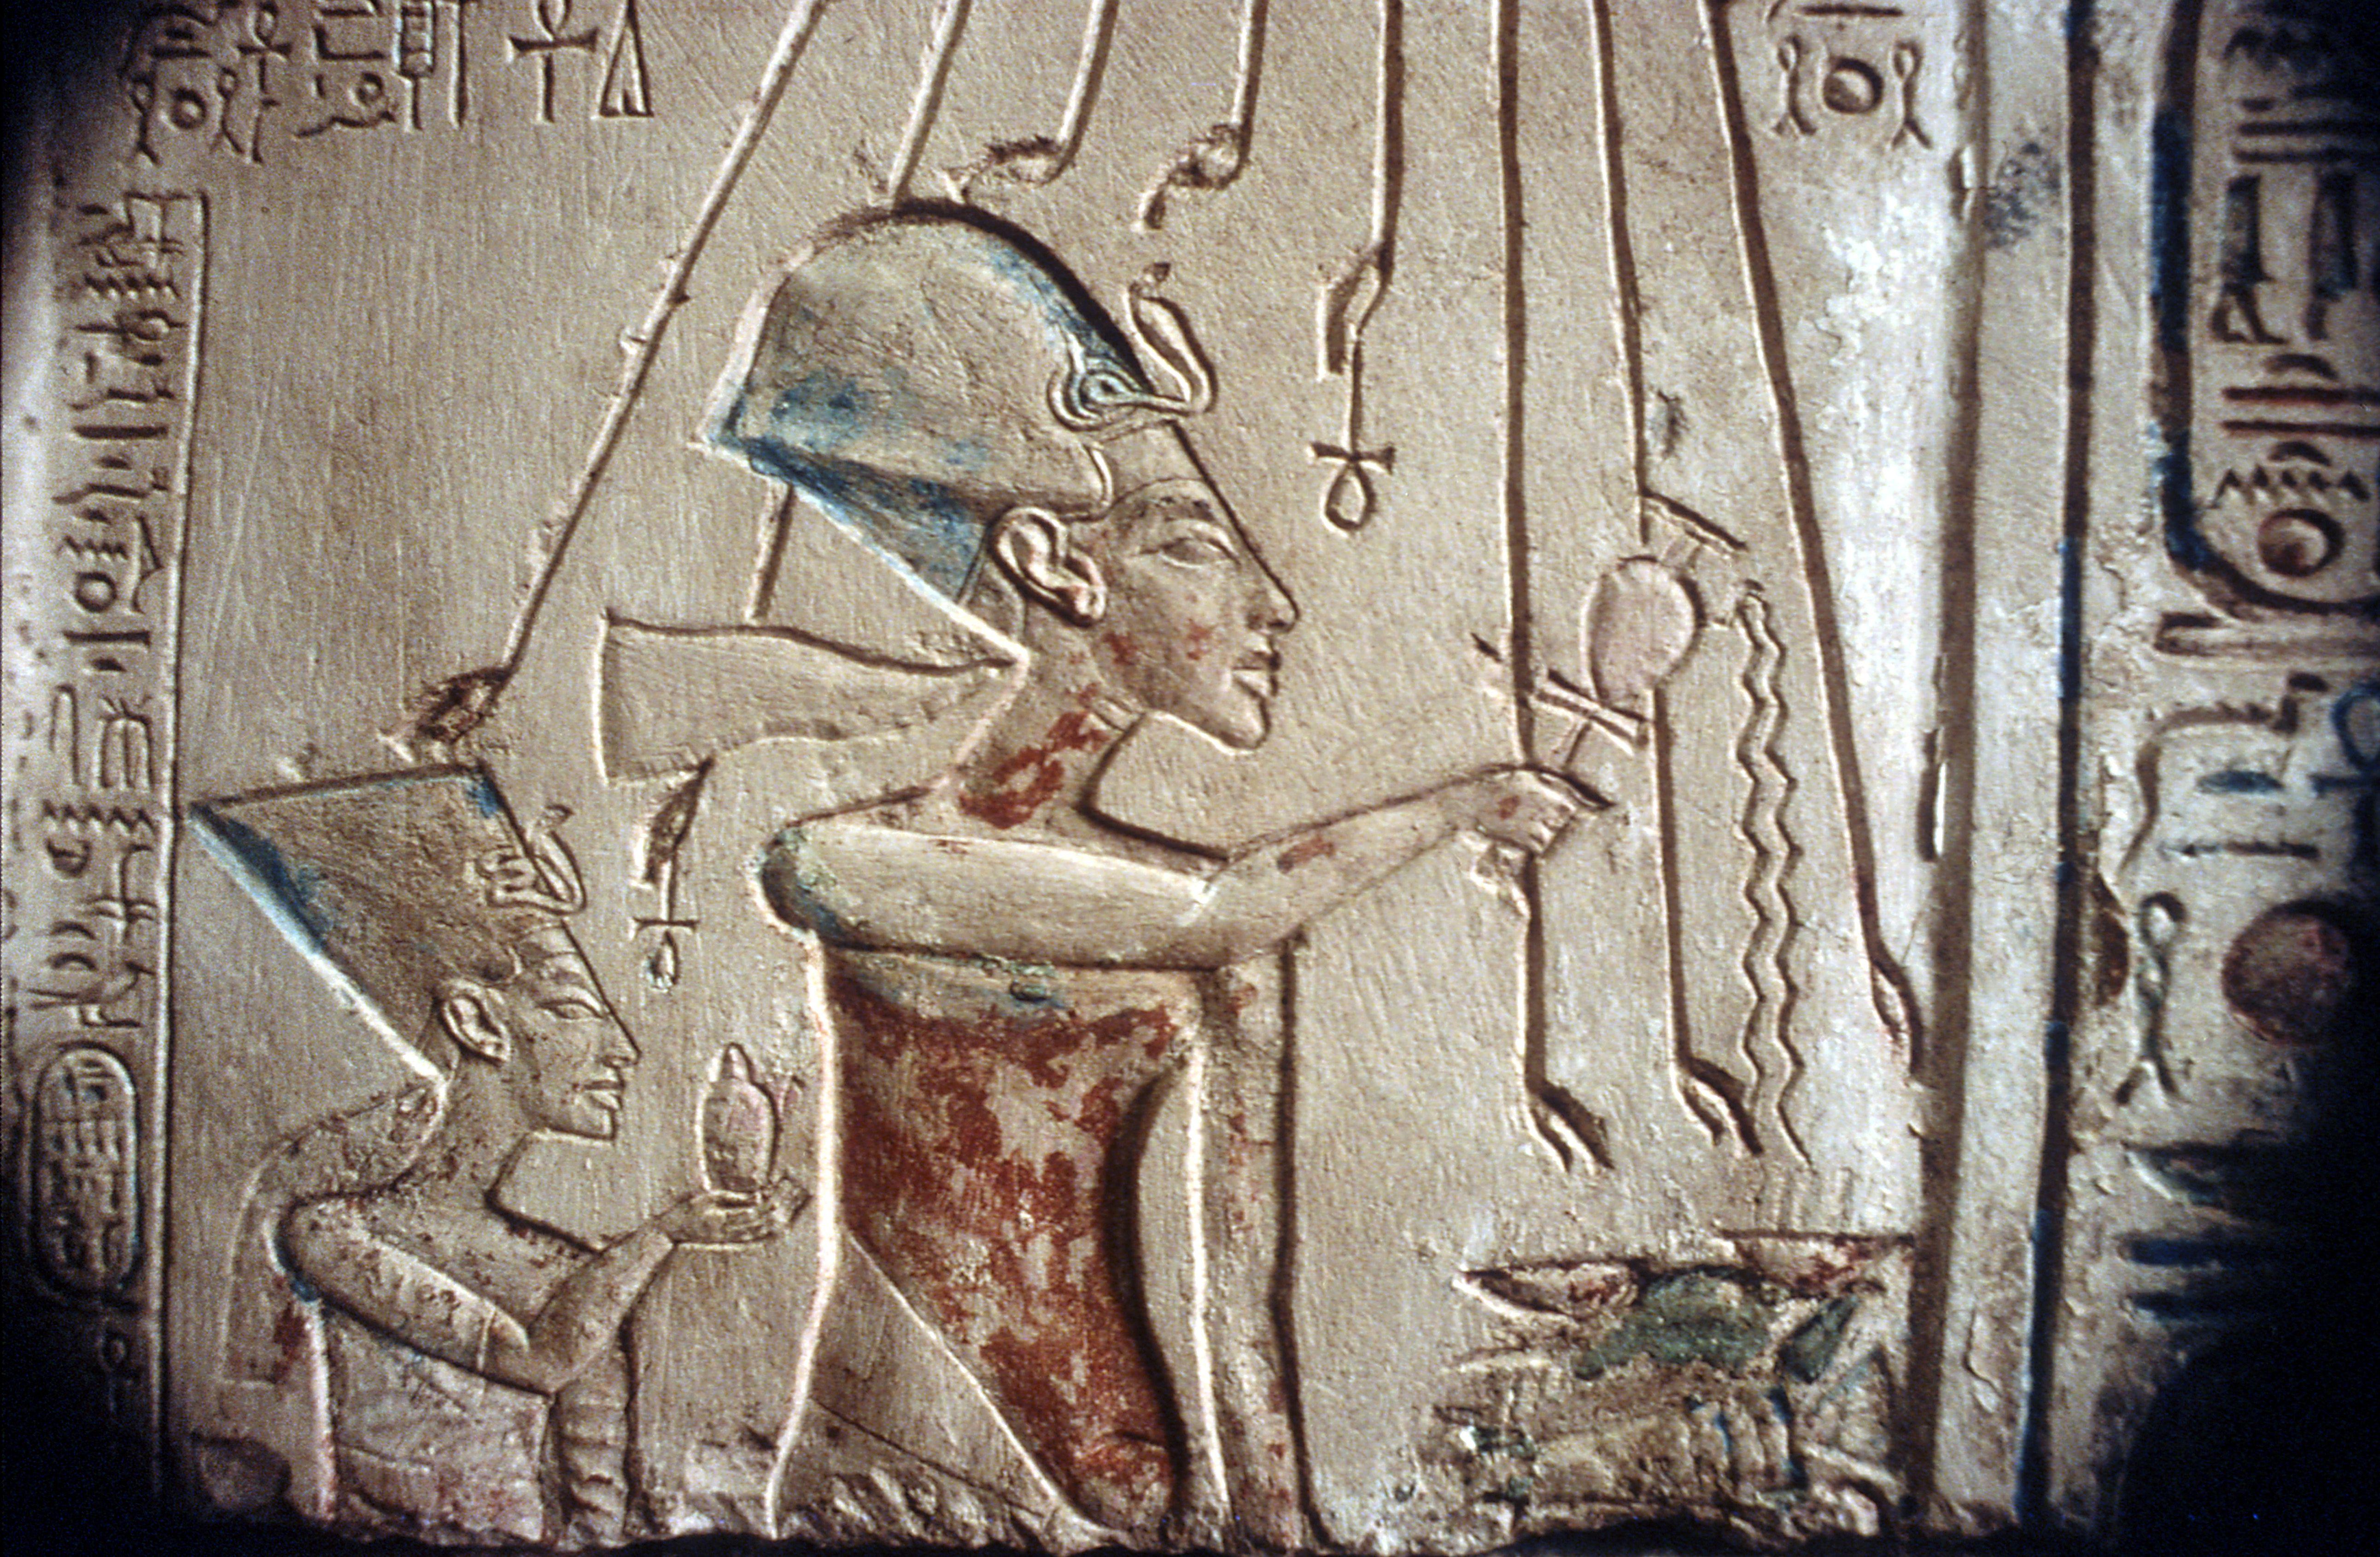 Relief of Akhenaten and Nefertiti under the rays of the sun-god Aten, Egyptian Museum, Cairo